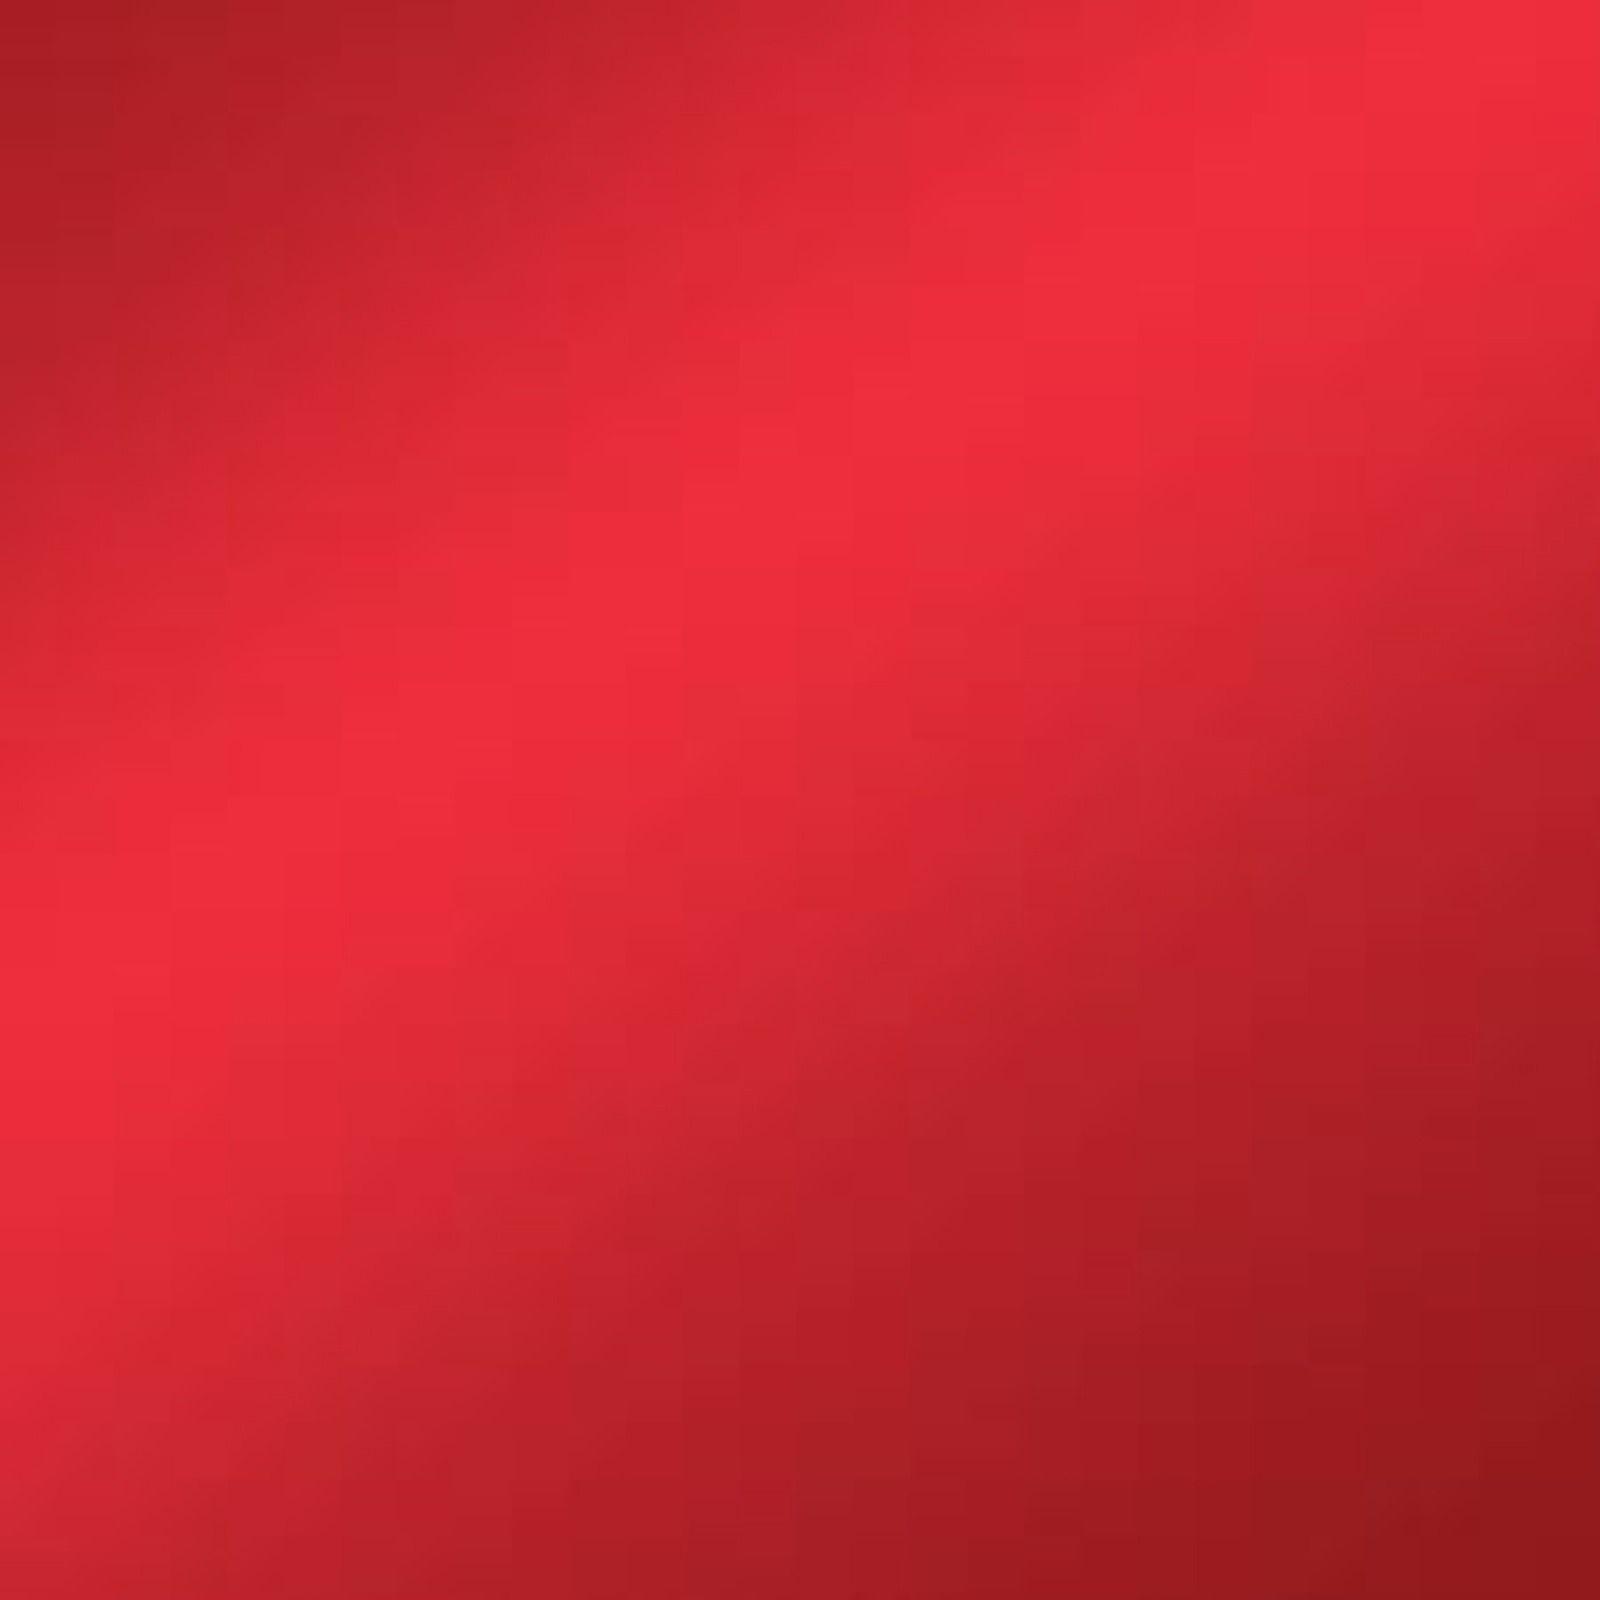 Mirror Red Plastic Sheet Www Decorativeplasticsheets Com Solid Color Backgrounds Hex Colors Pantone Color